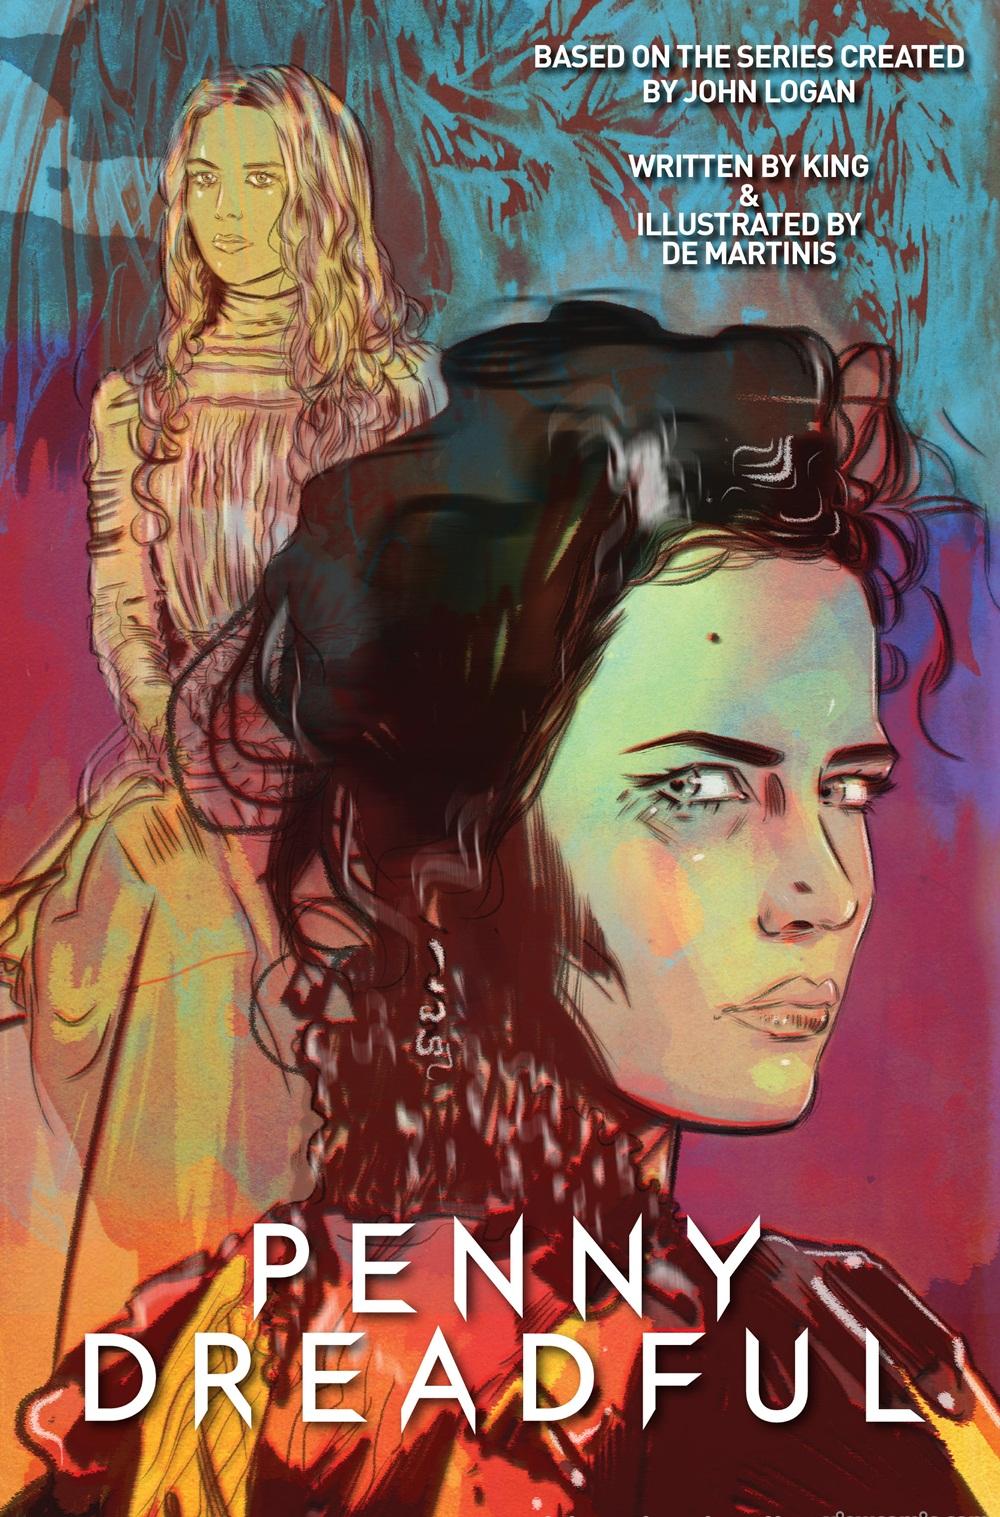 Penny Dreadful 004 (2016)  | Vietcomic.net reading comics online for free